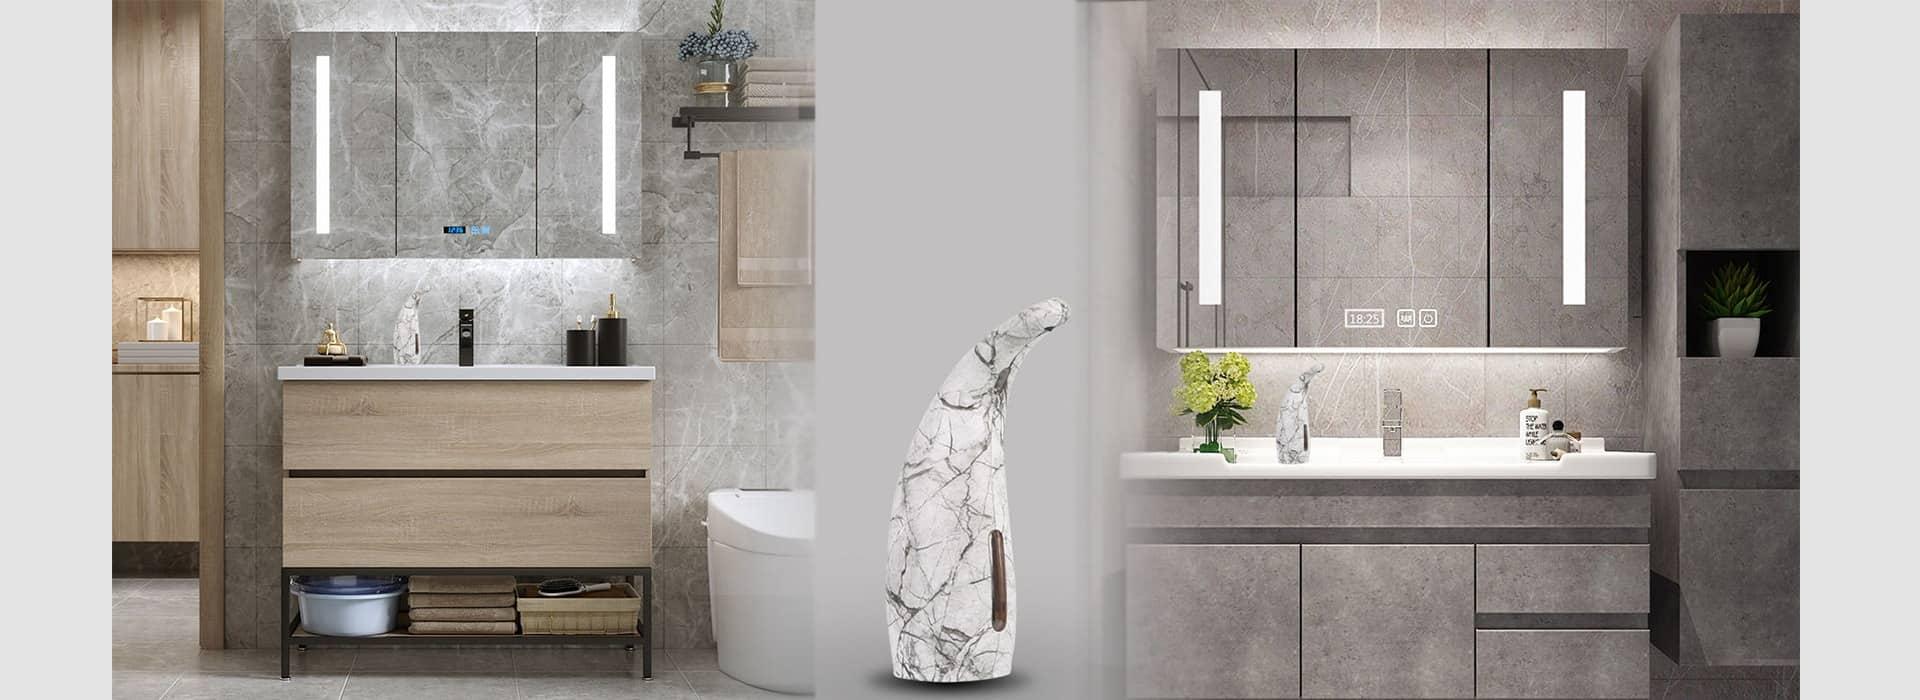 automatic soap dispenser for bathroom